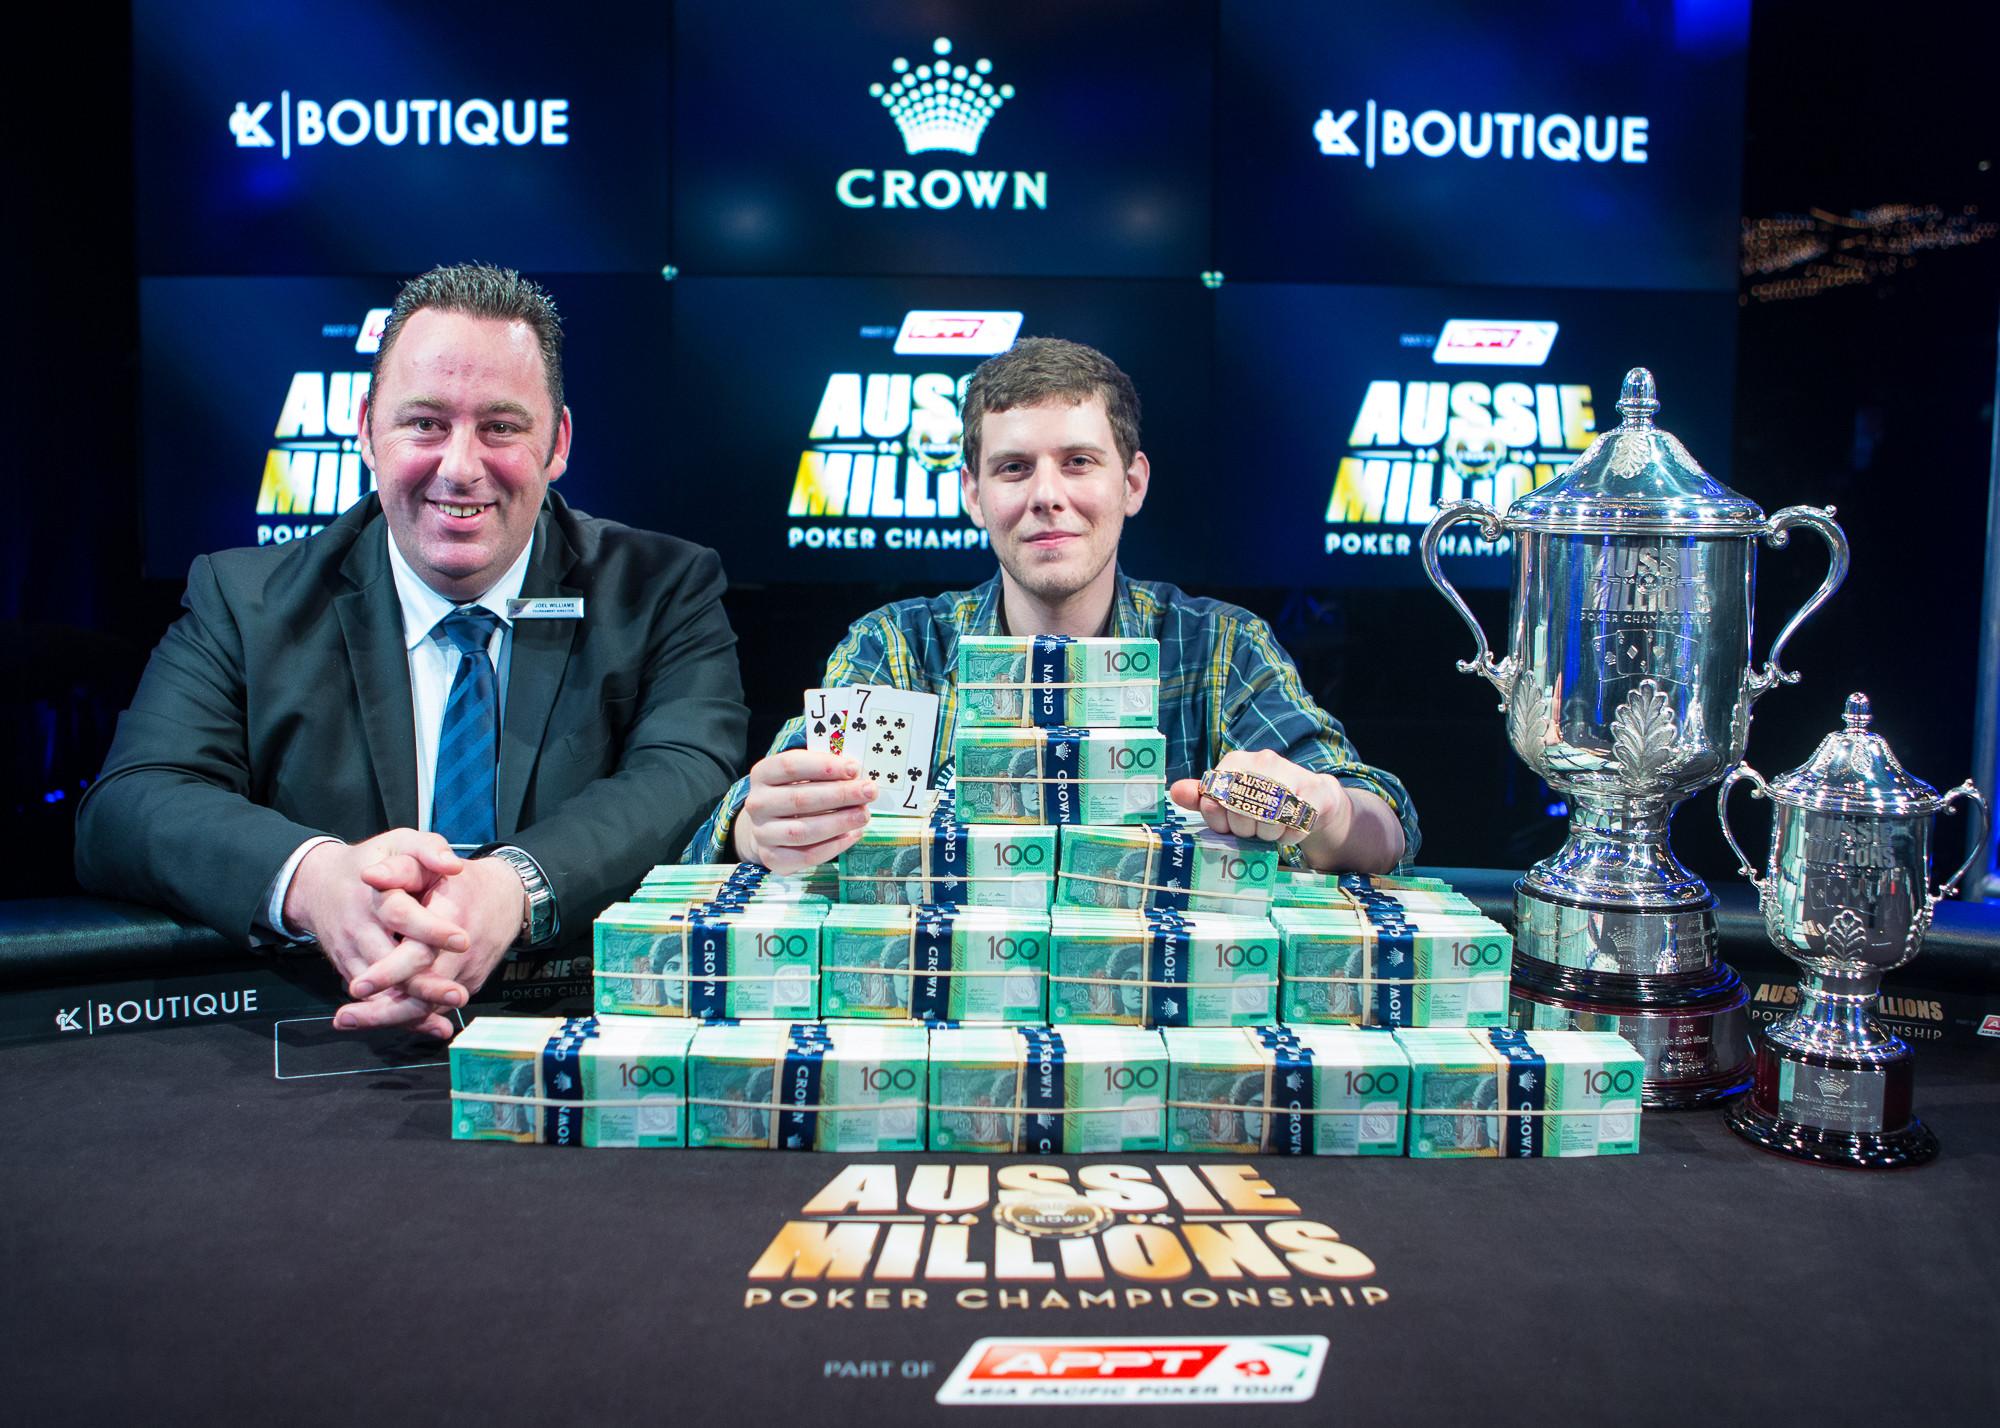 Ari Engel Wins the 2016 Aussie Millions Main Event